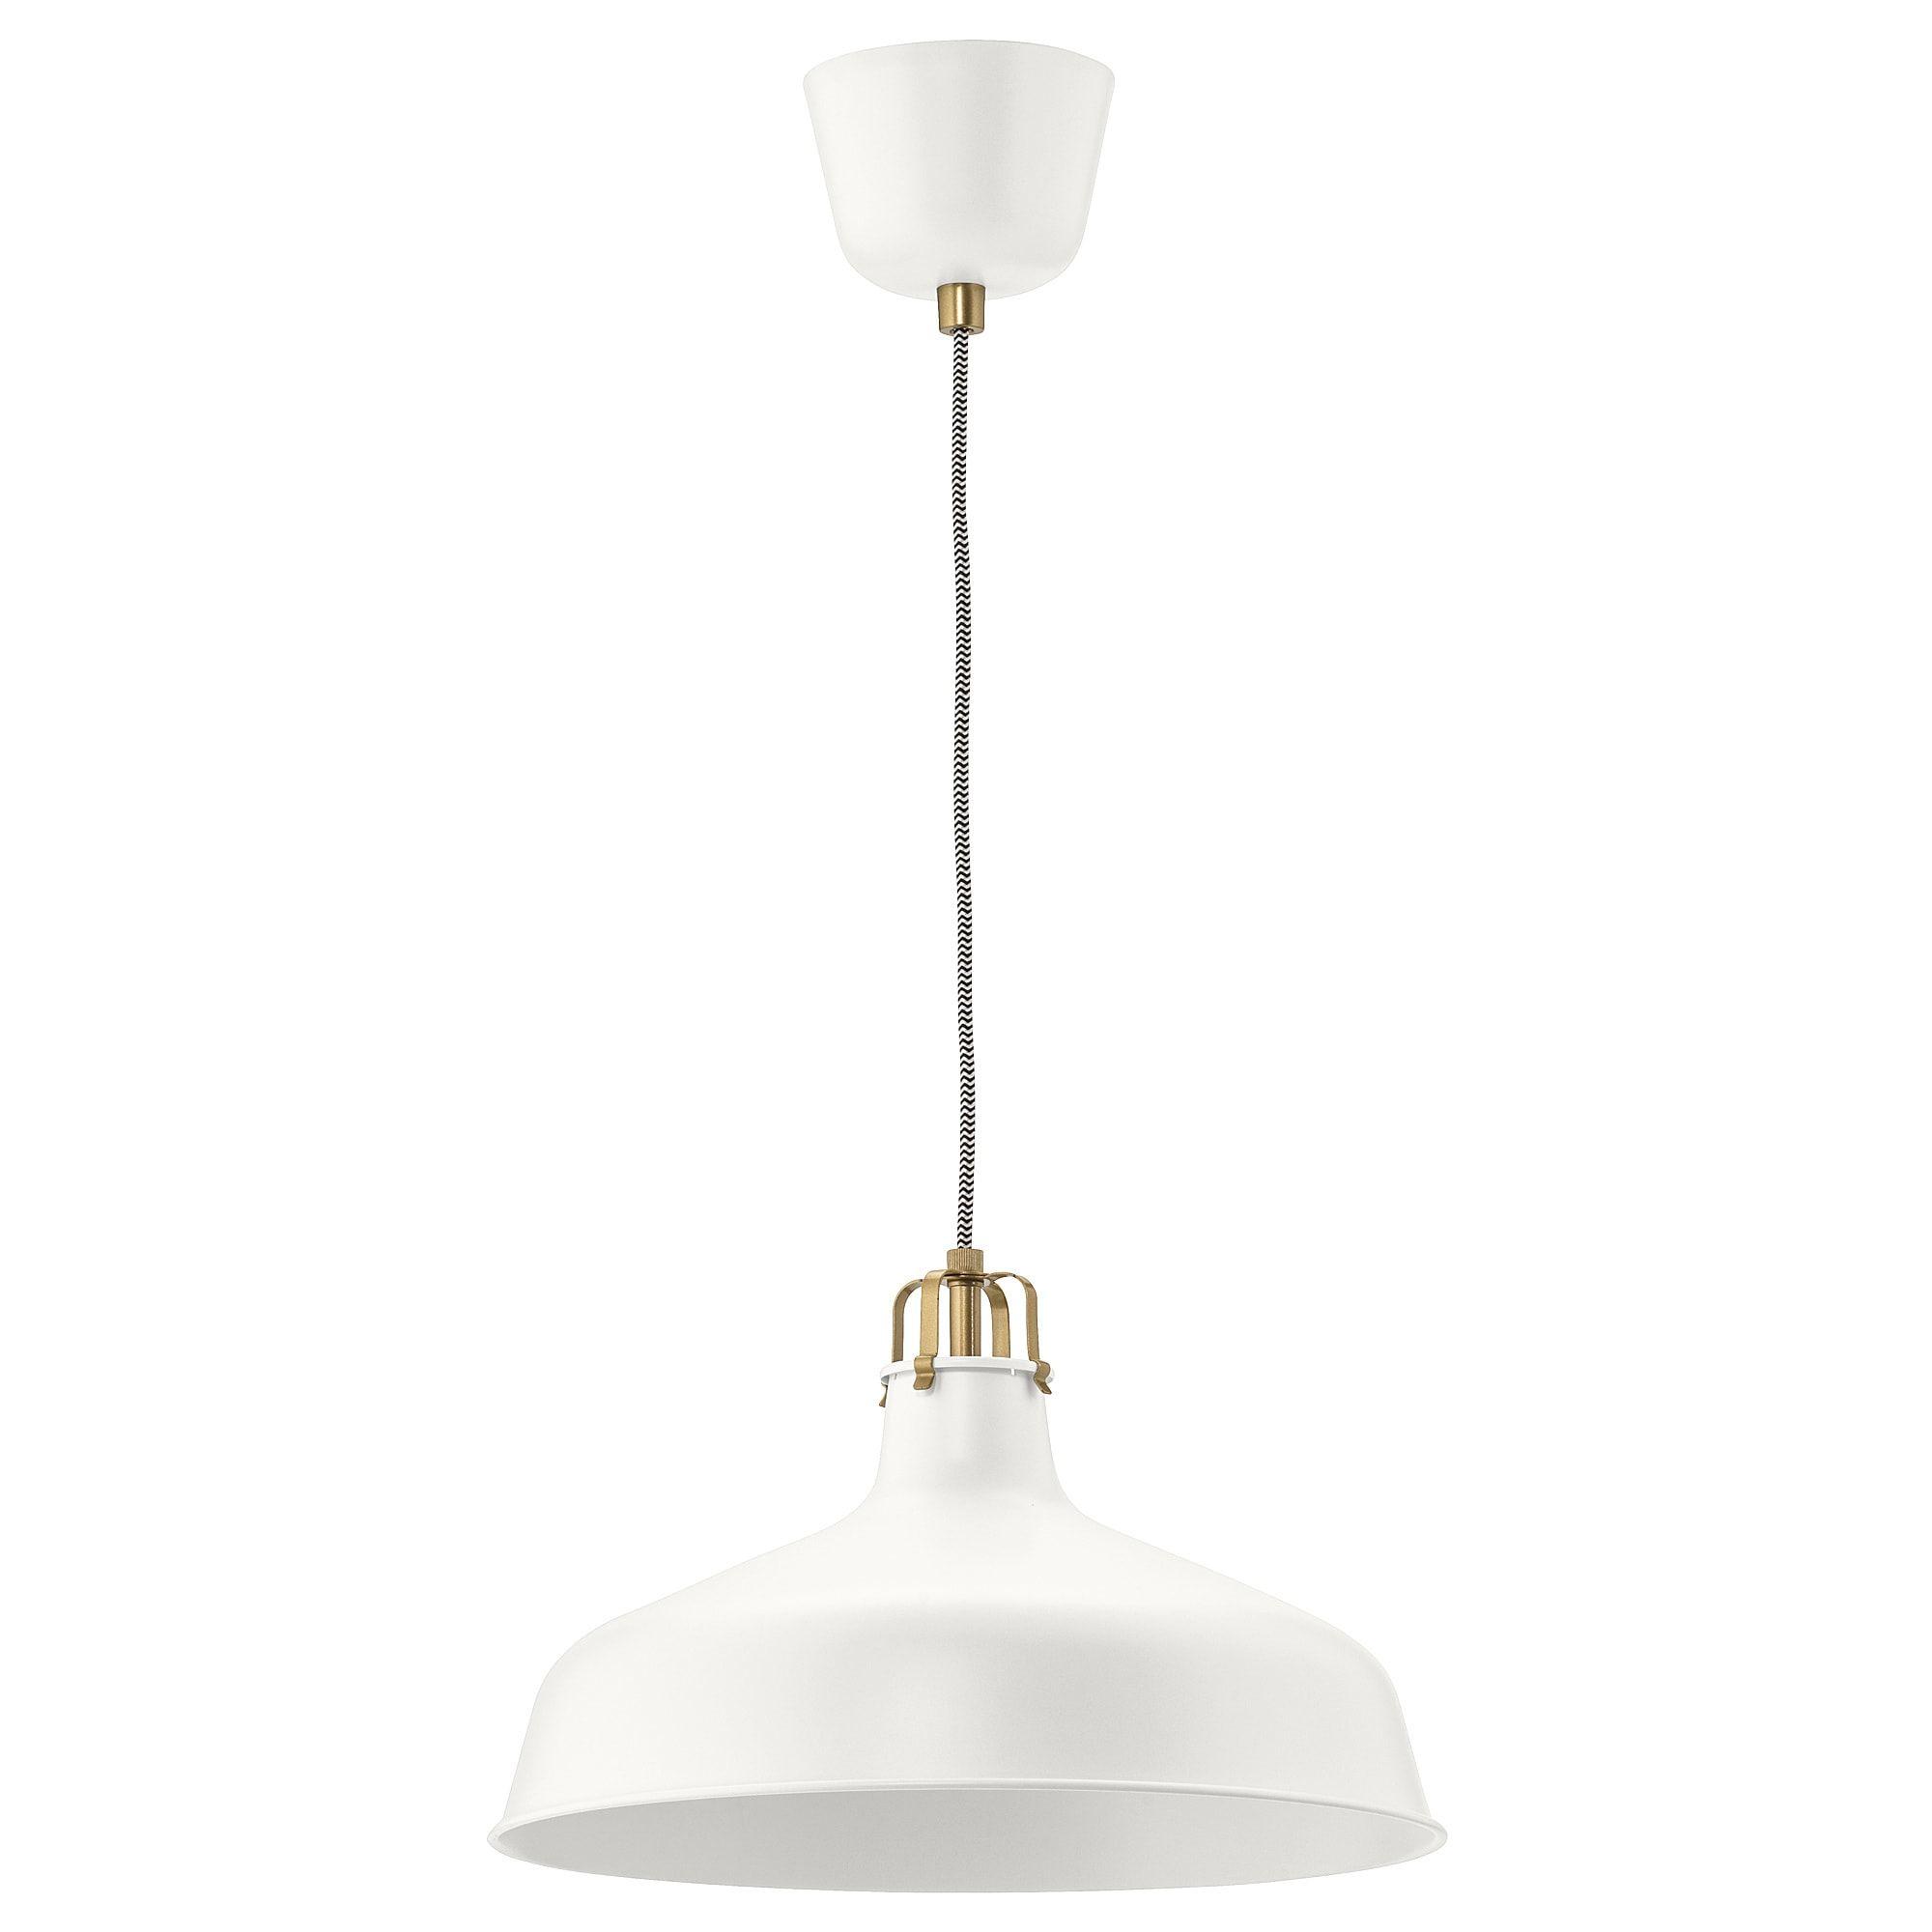 Ranarp Pendant Lamp Off White Ikea Pendant Lamp White Pendant Lamp Ikea Pendant Light